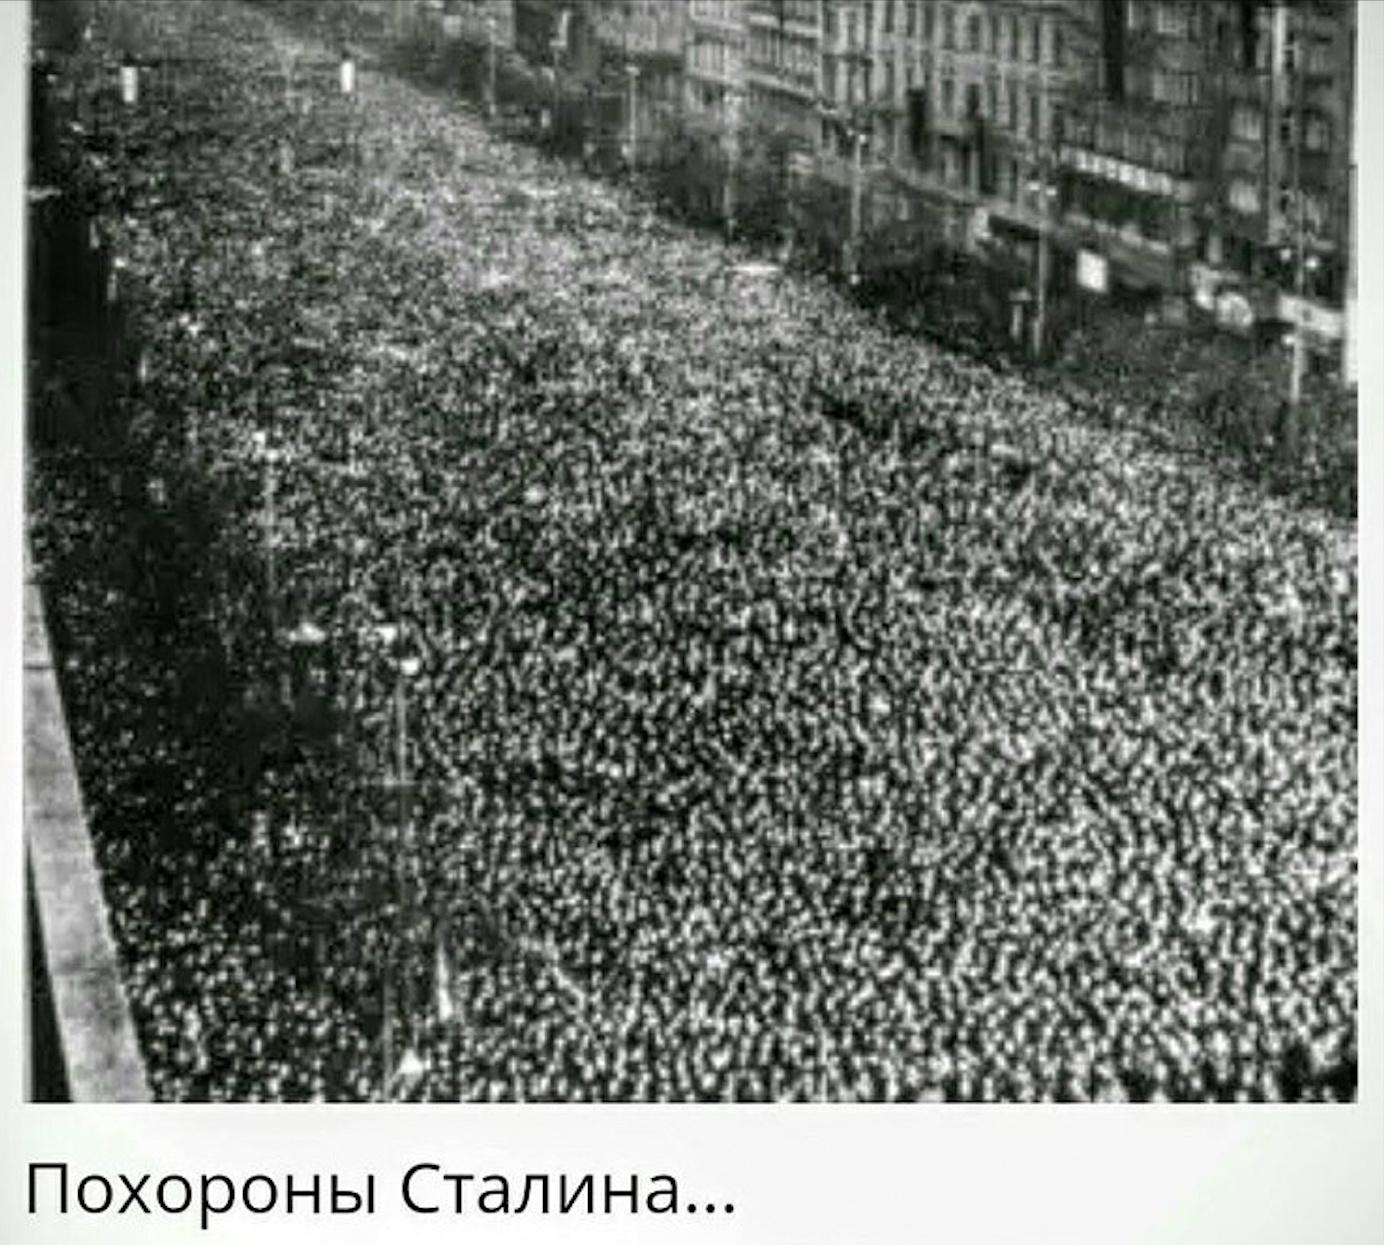 pohorony-stalina-ogromnoe-skoplenie-lyudei